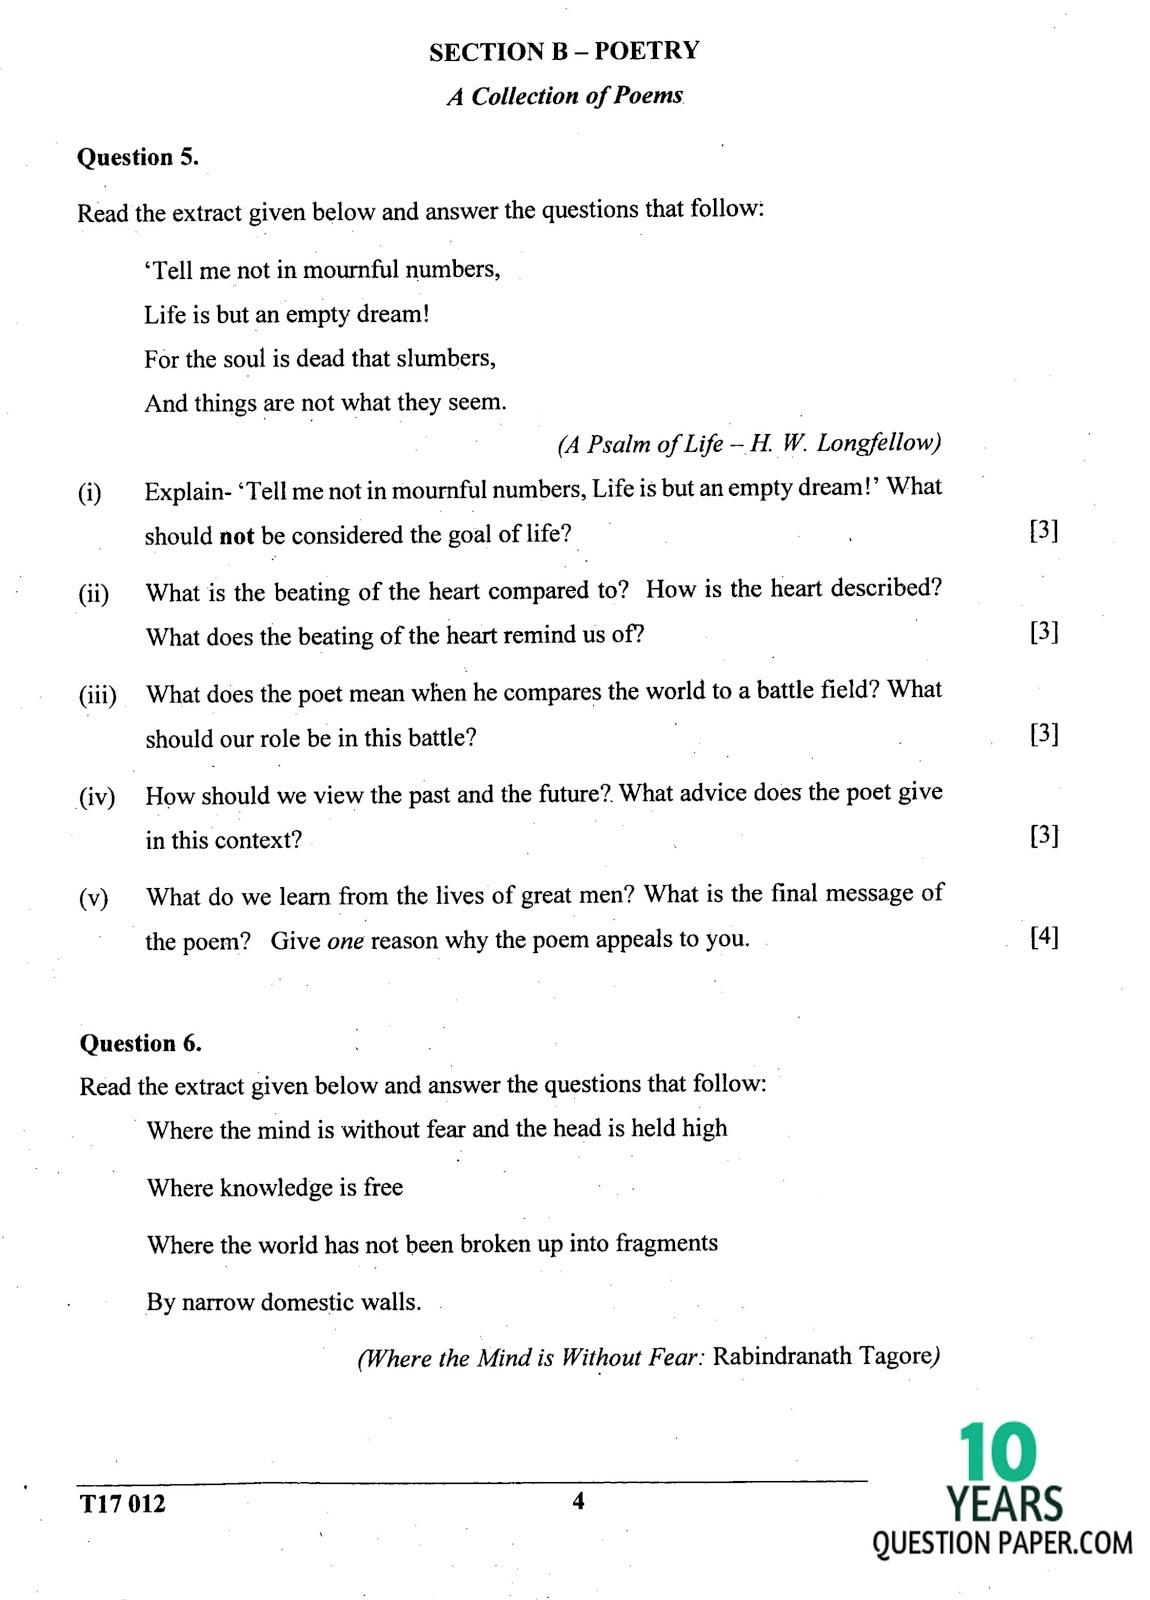 ICSE Class 10 English Literature 2017 Question Paper